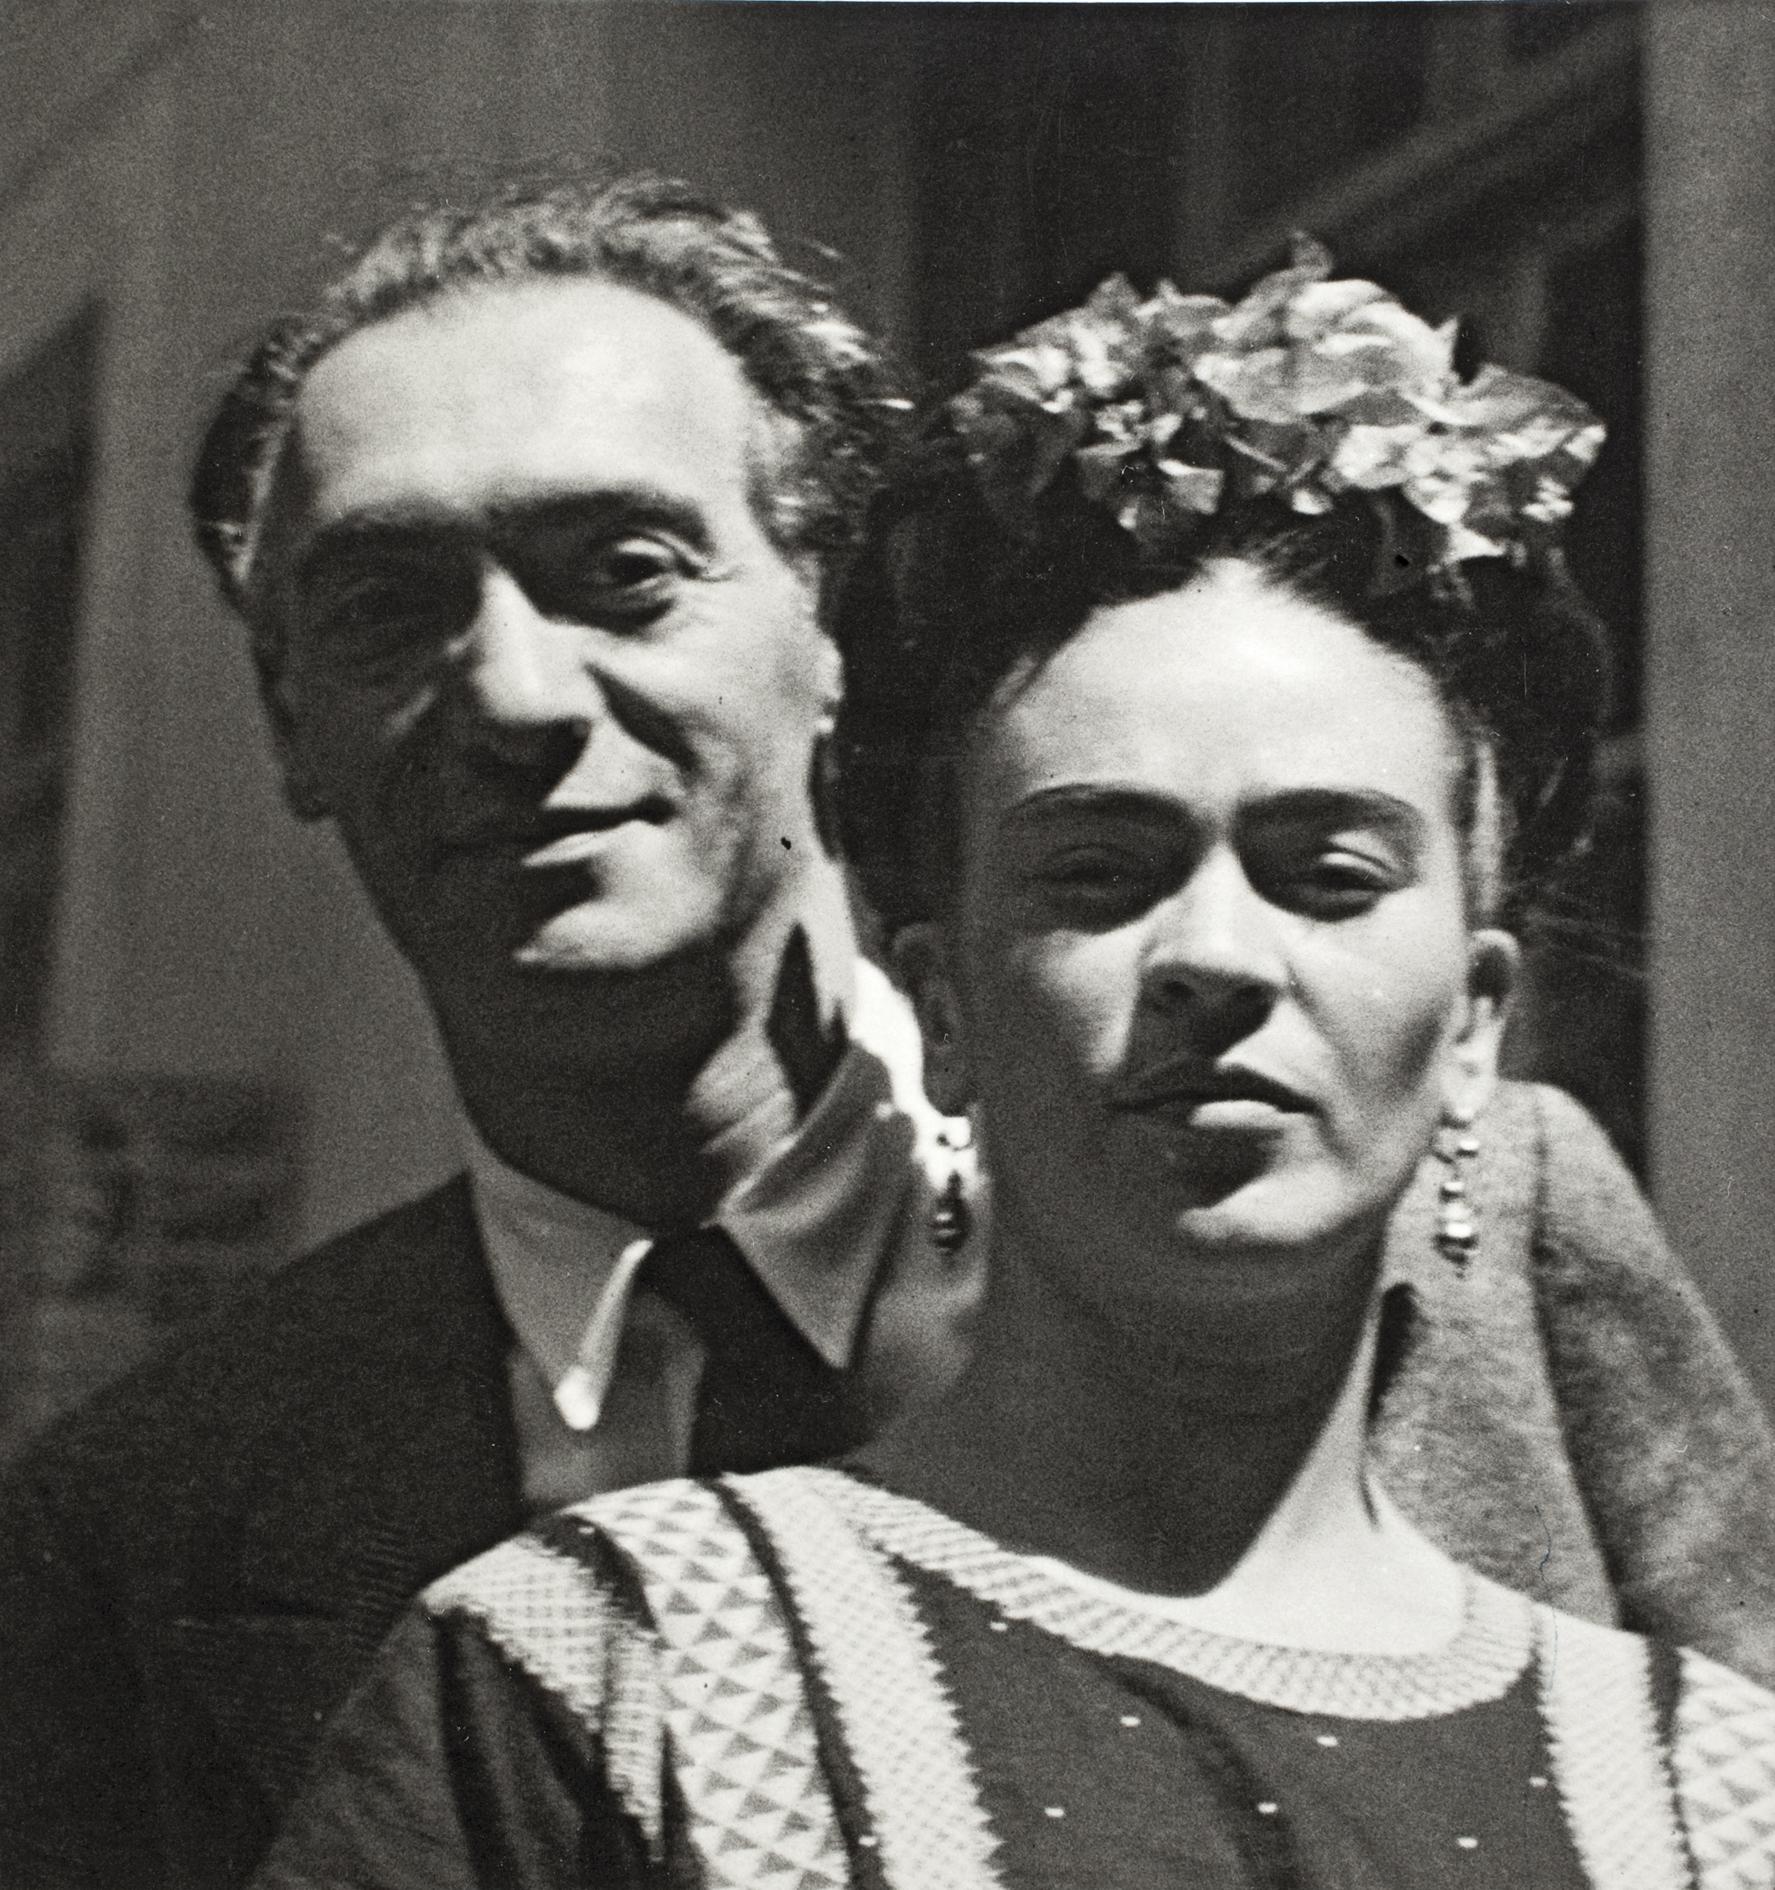 Nickolas Muray and Frida Kahlo , by Nickolas Muray, 1939 ©Frida Kahlo Museum